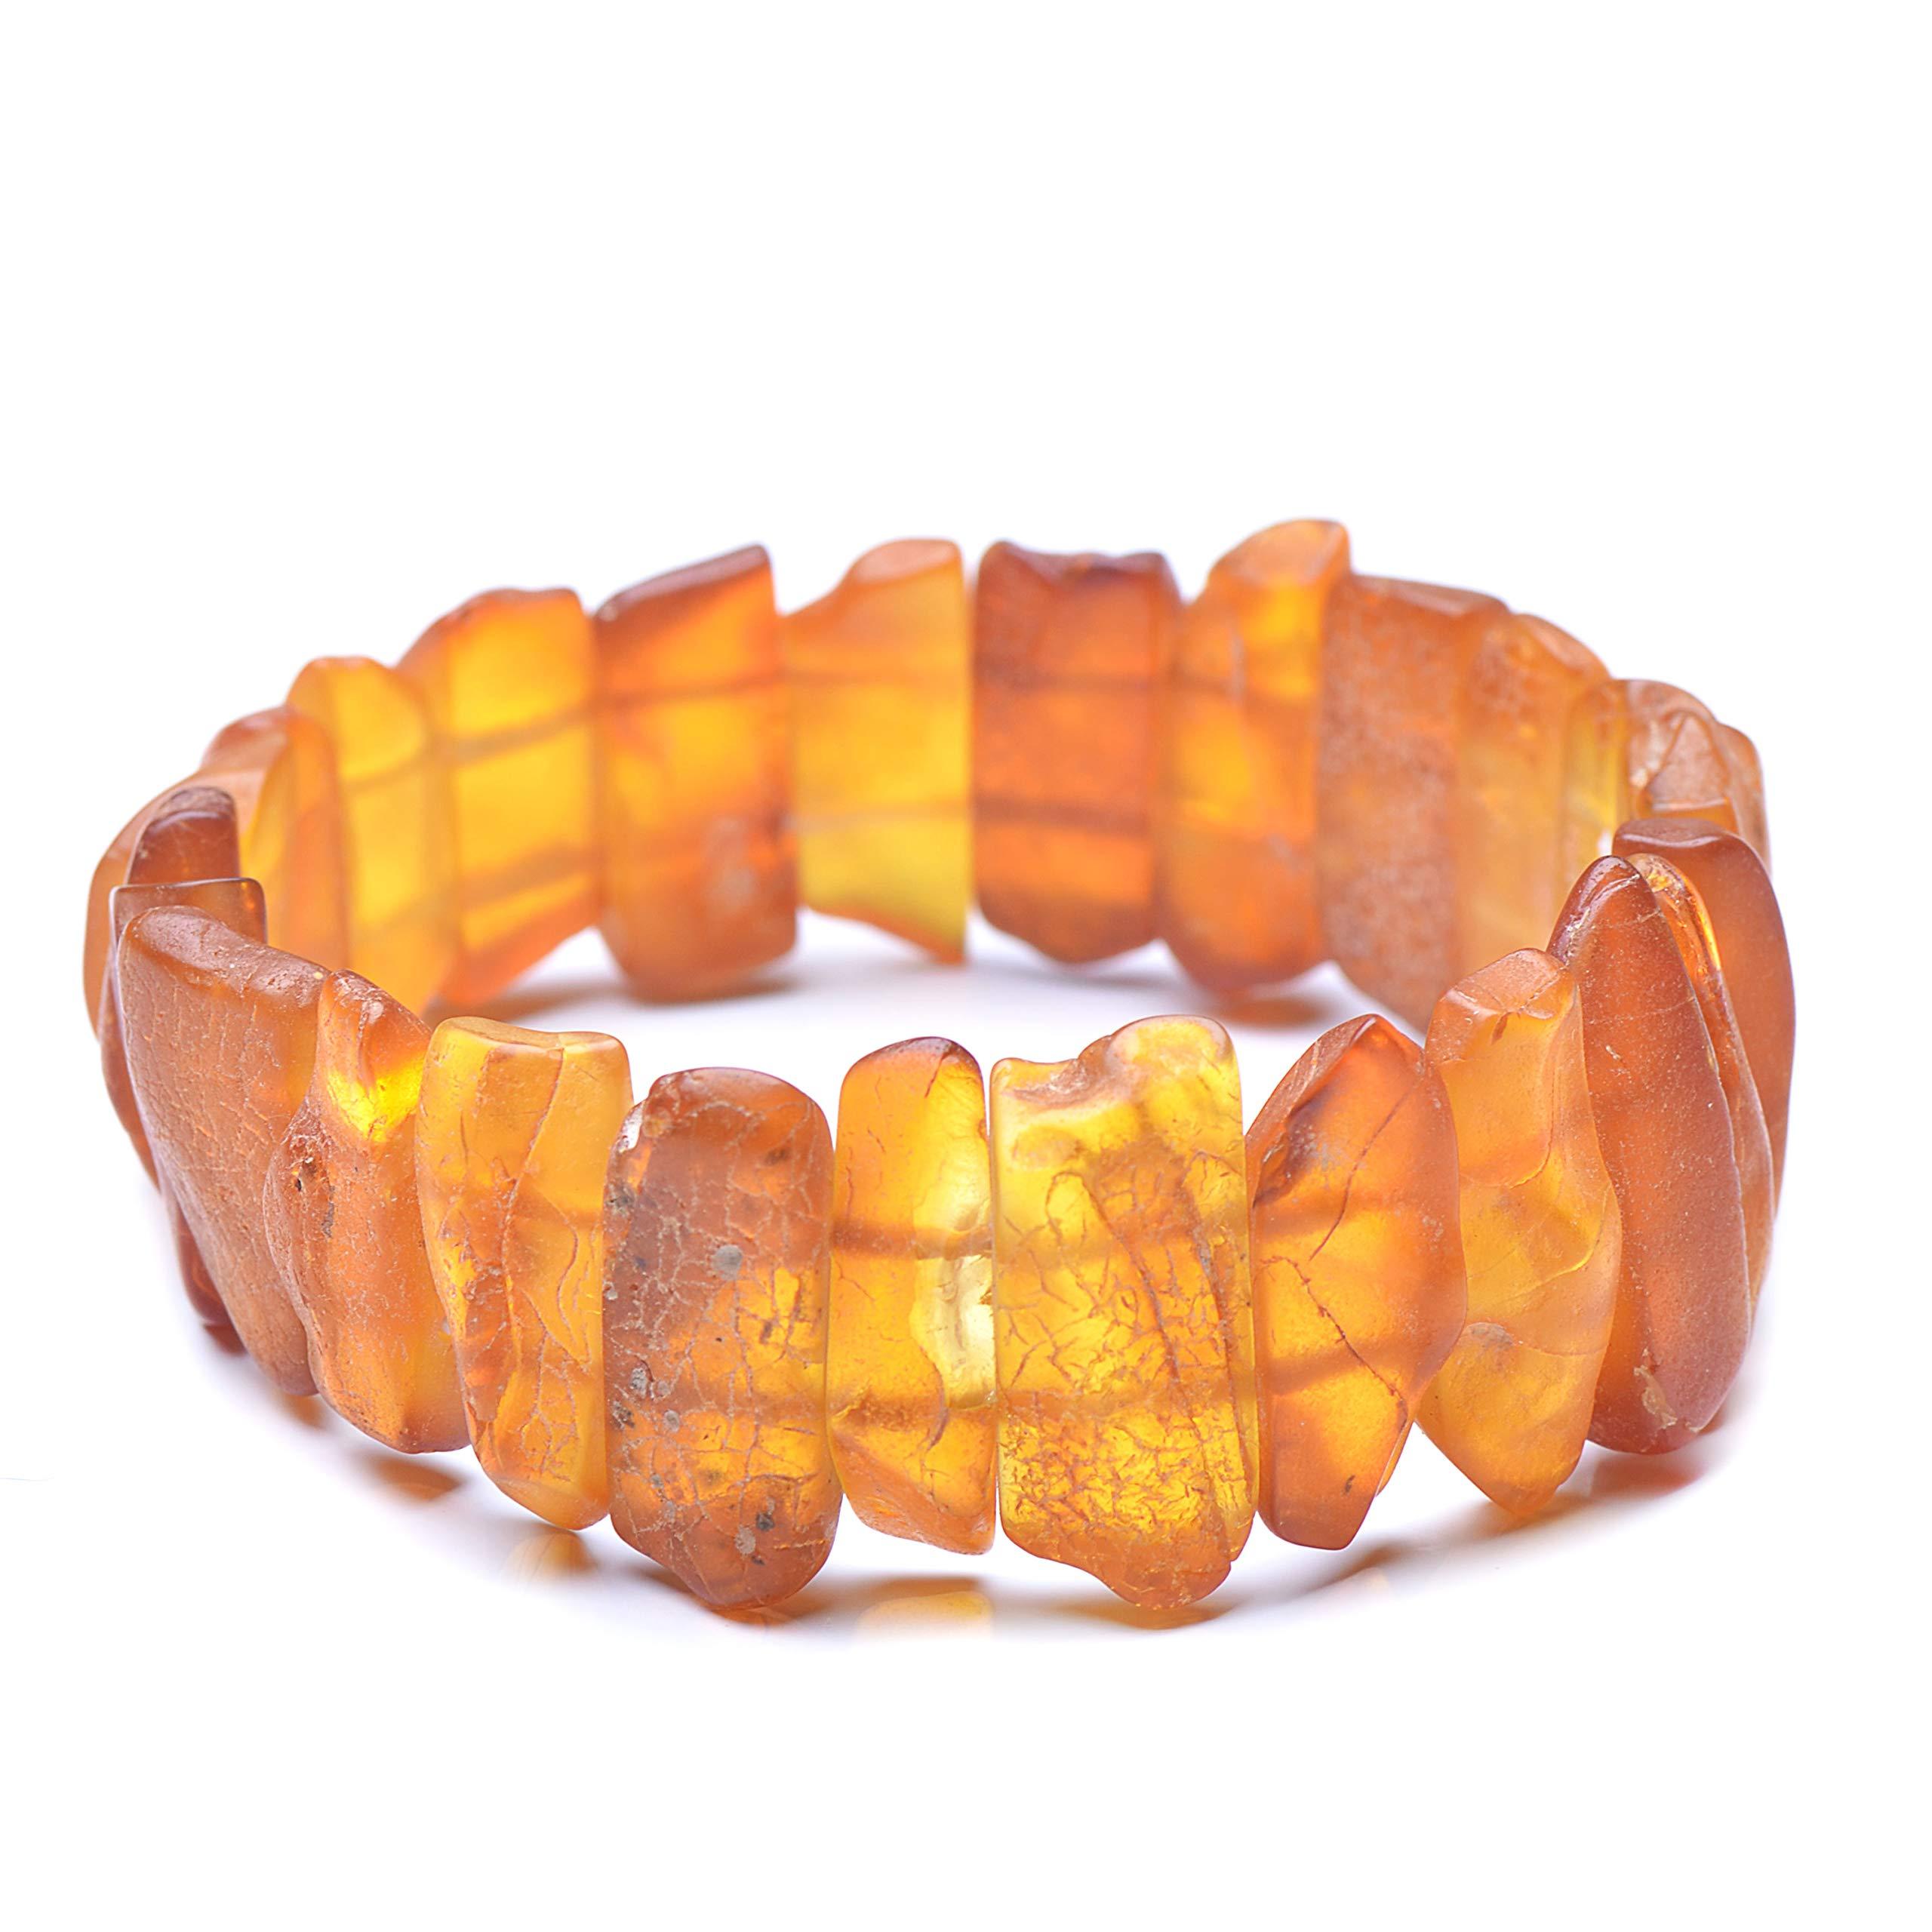 Amber Bracelet - Unique Amber Bracelet - Exclusive Amber Bracelet - Vintage Bracelet - Genuine Baltic Amber by Genuine Amber (Image #1)